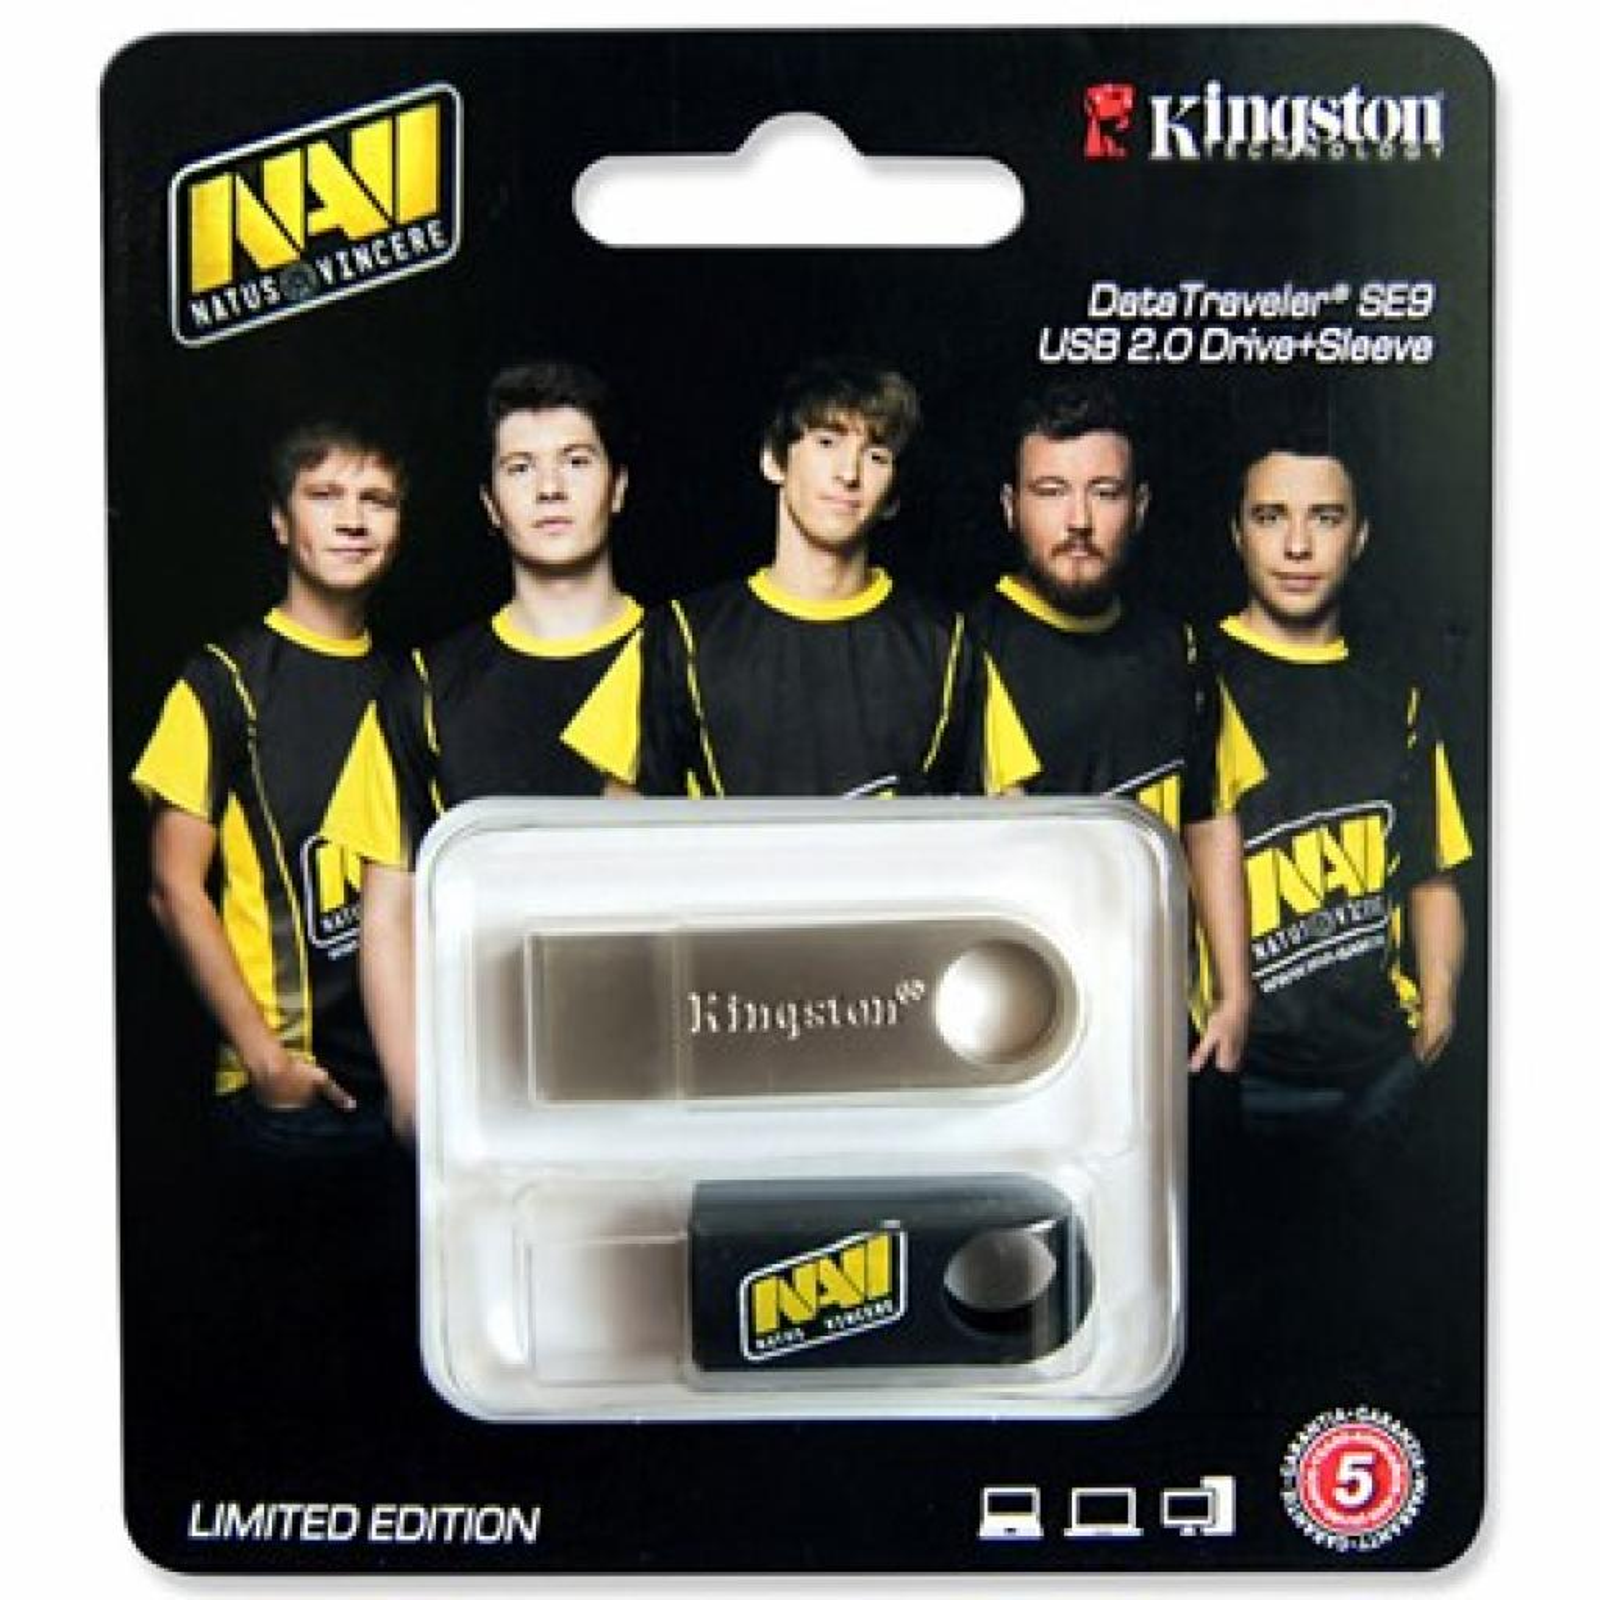 USB флеш накопитель Kingston 16Gb DataTraveler SE9 Na'Vi edition (DTSE9H/16GB-NV / KC-U4616-4B)